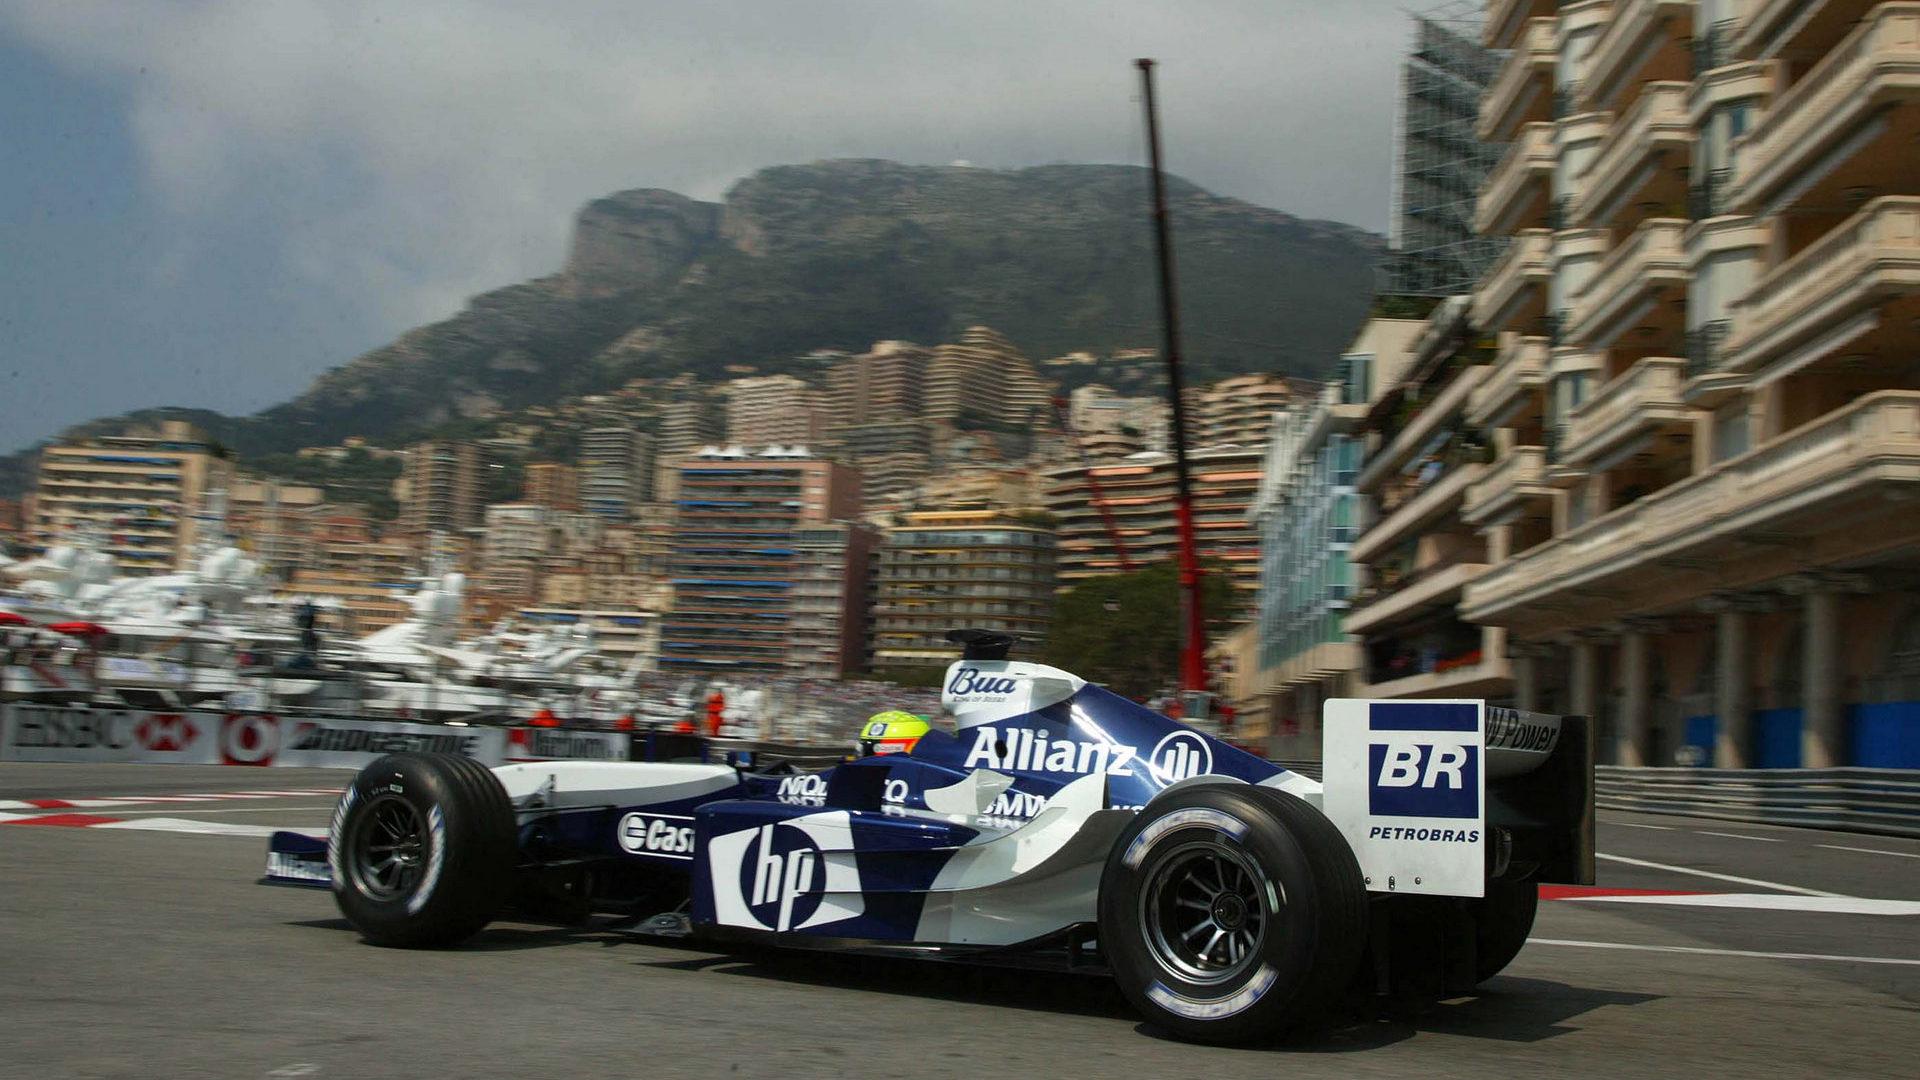 HD Wallpapers 2004 Formula 1 Grand Prix of Monaco  F1